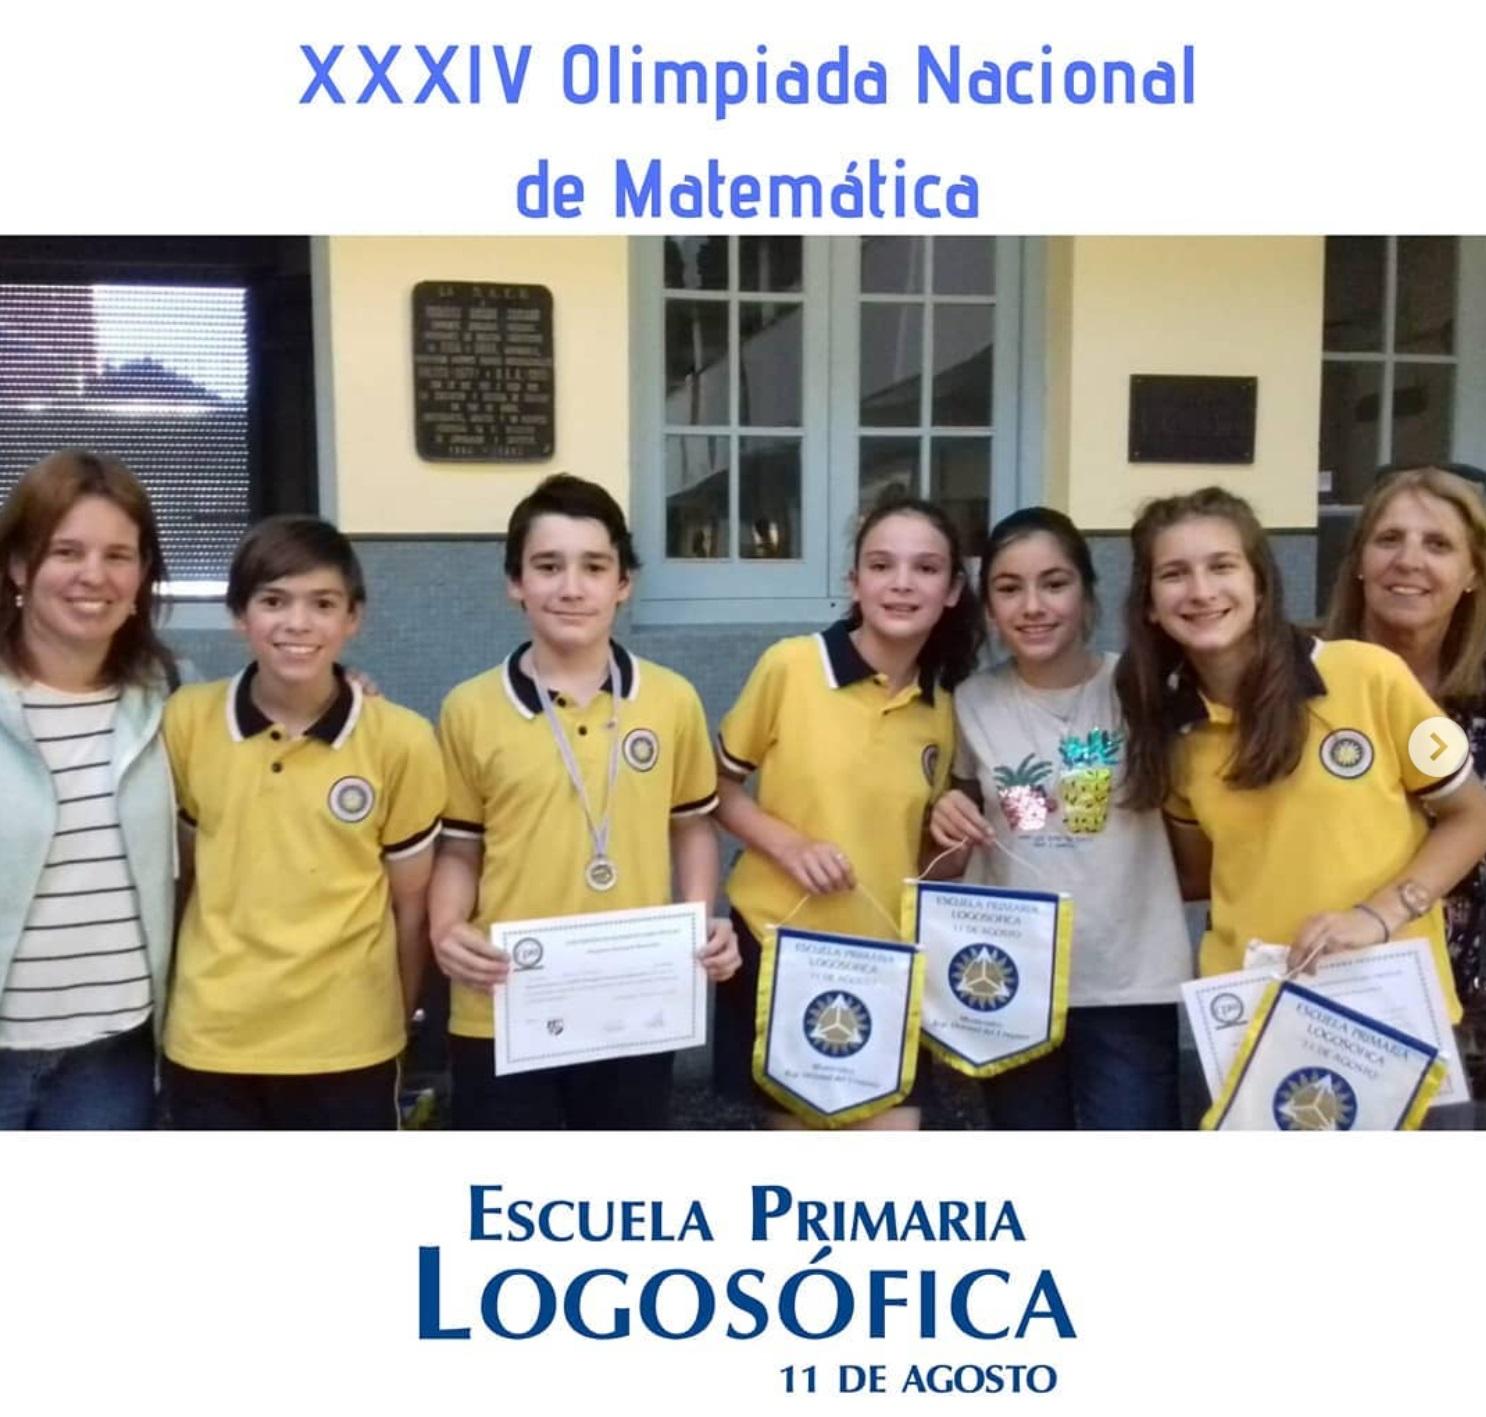 escuela logosófica premiada olimpíadas de matemática